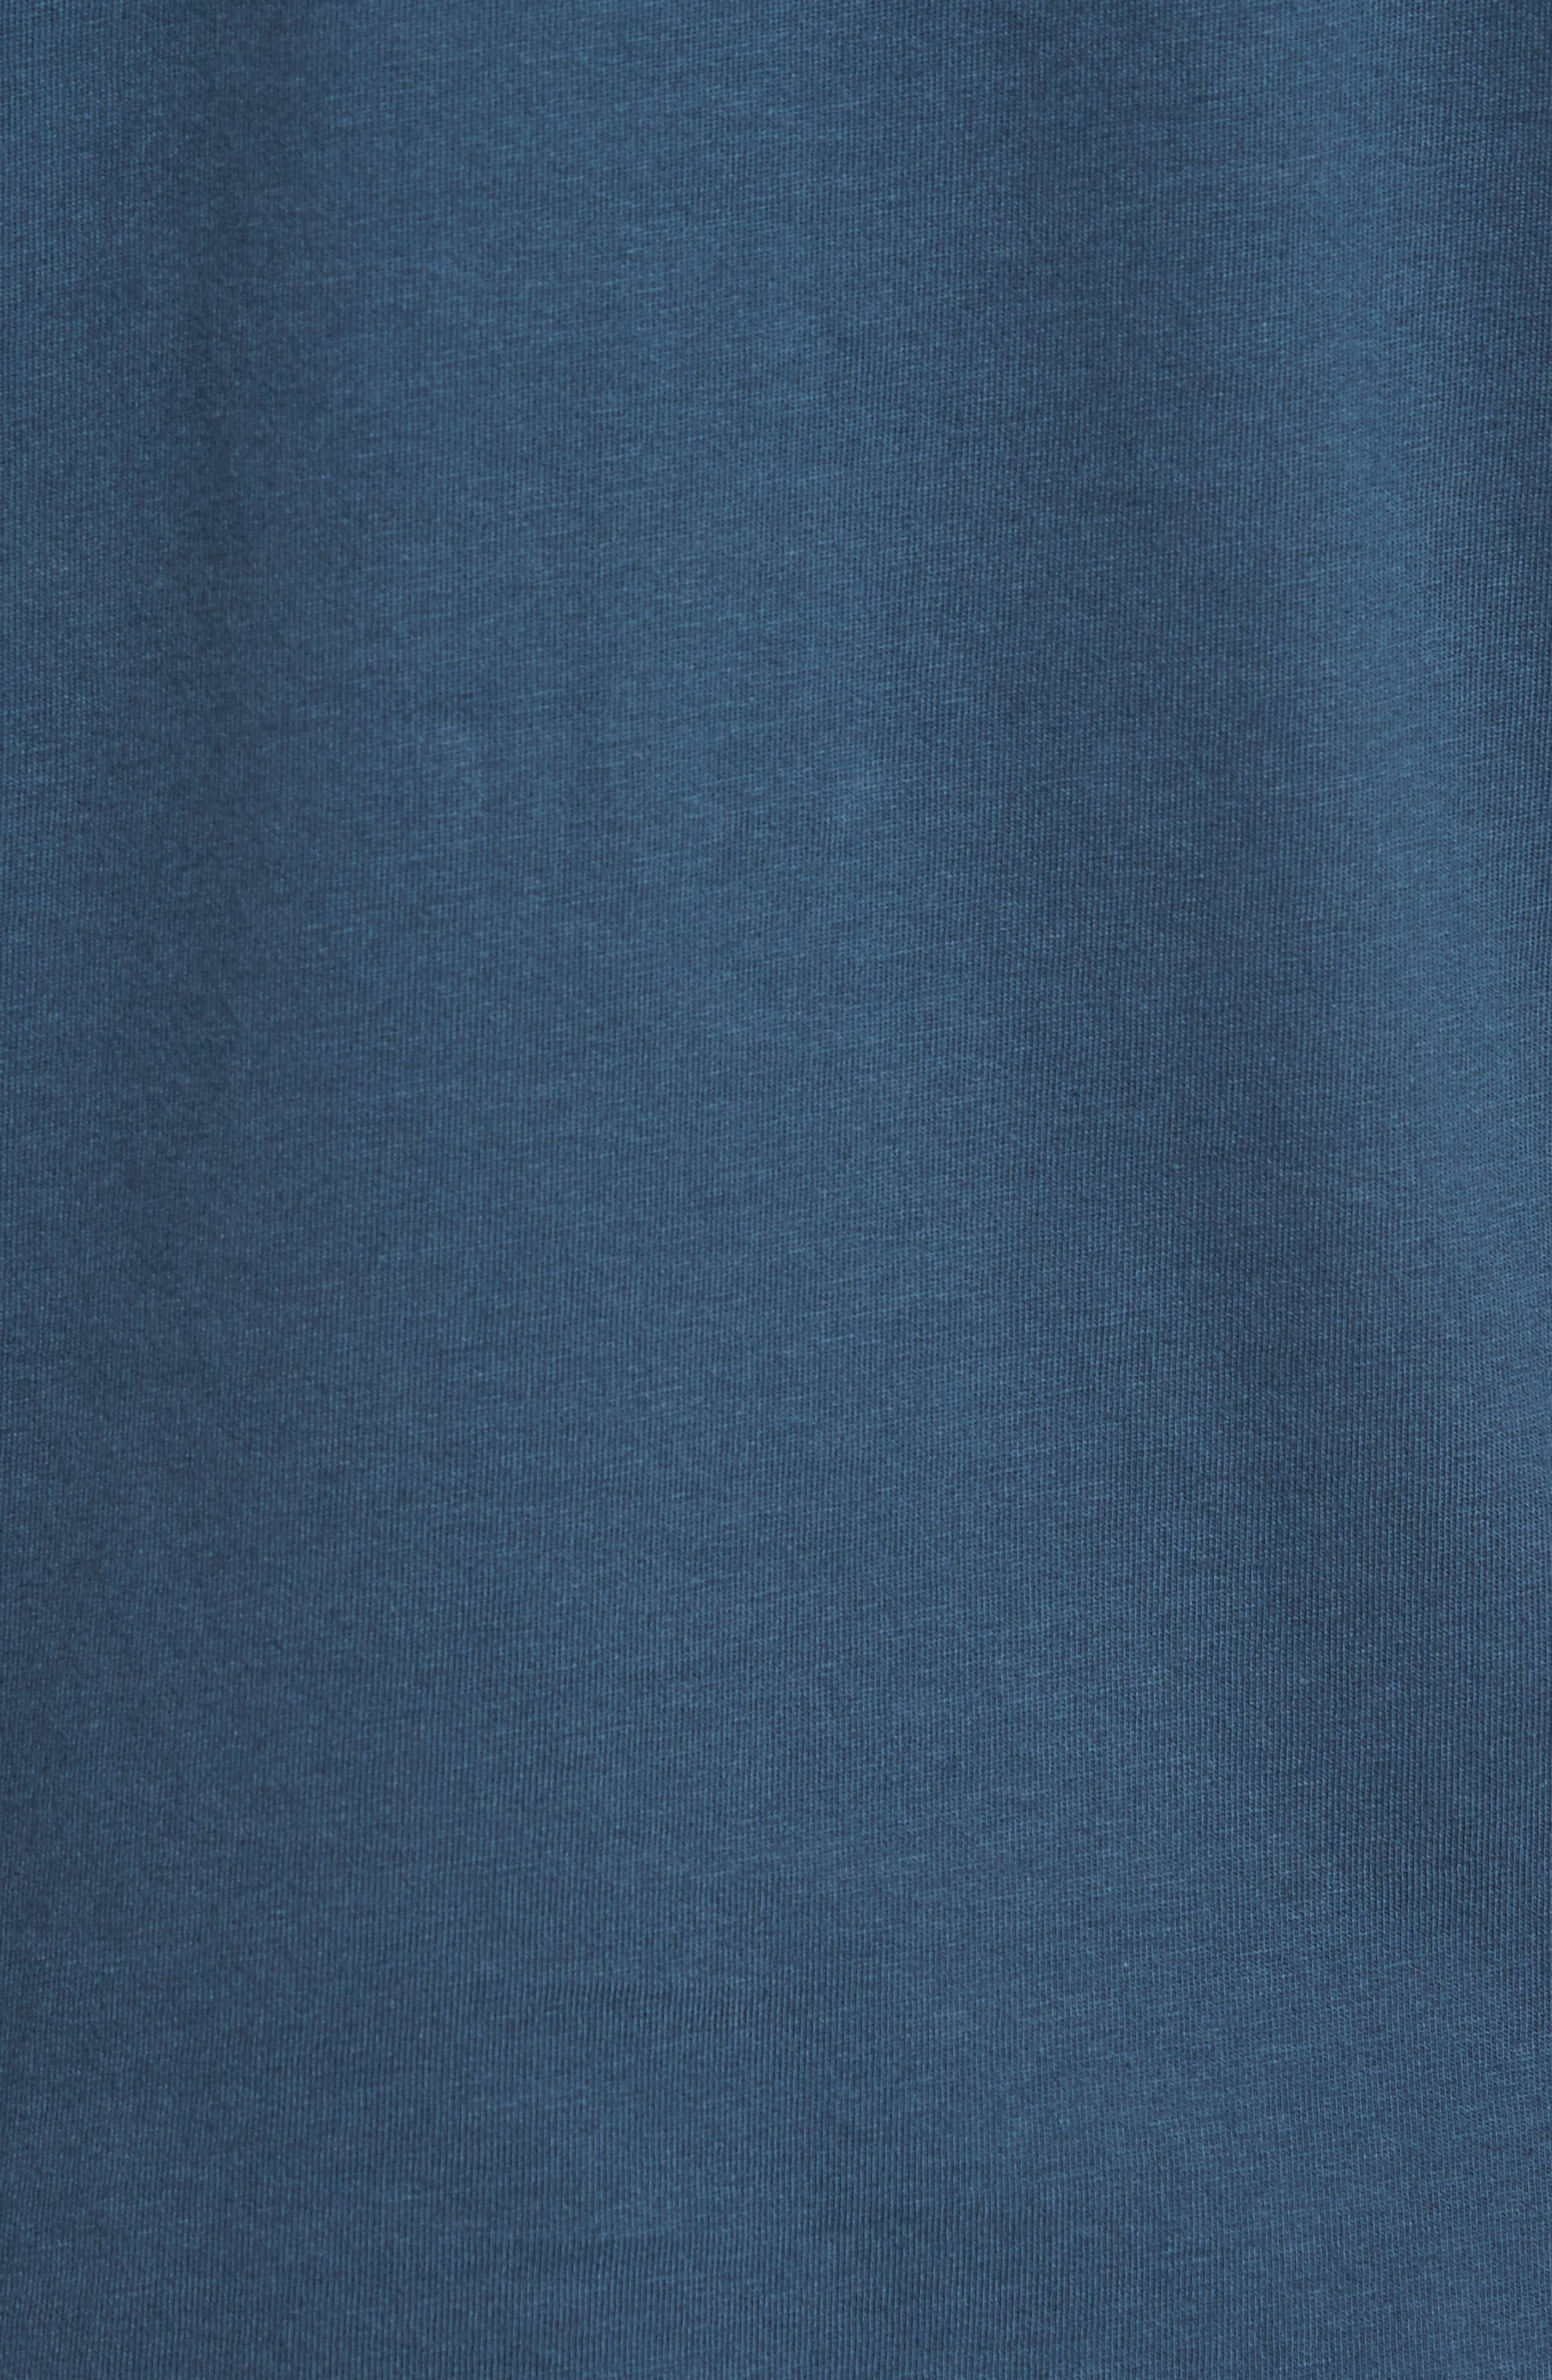 PBFU Graphic T-Shirt,                             Alternate thumbnail 5, color,                             400